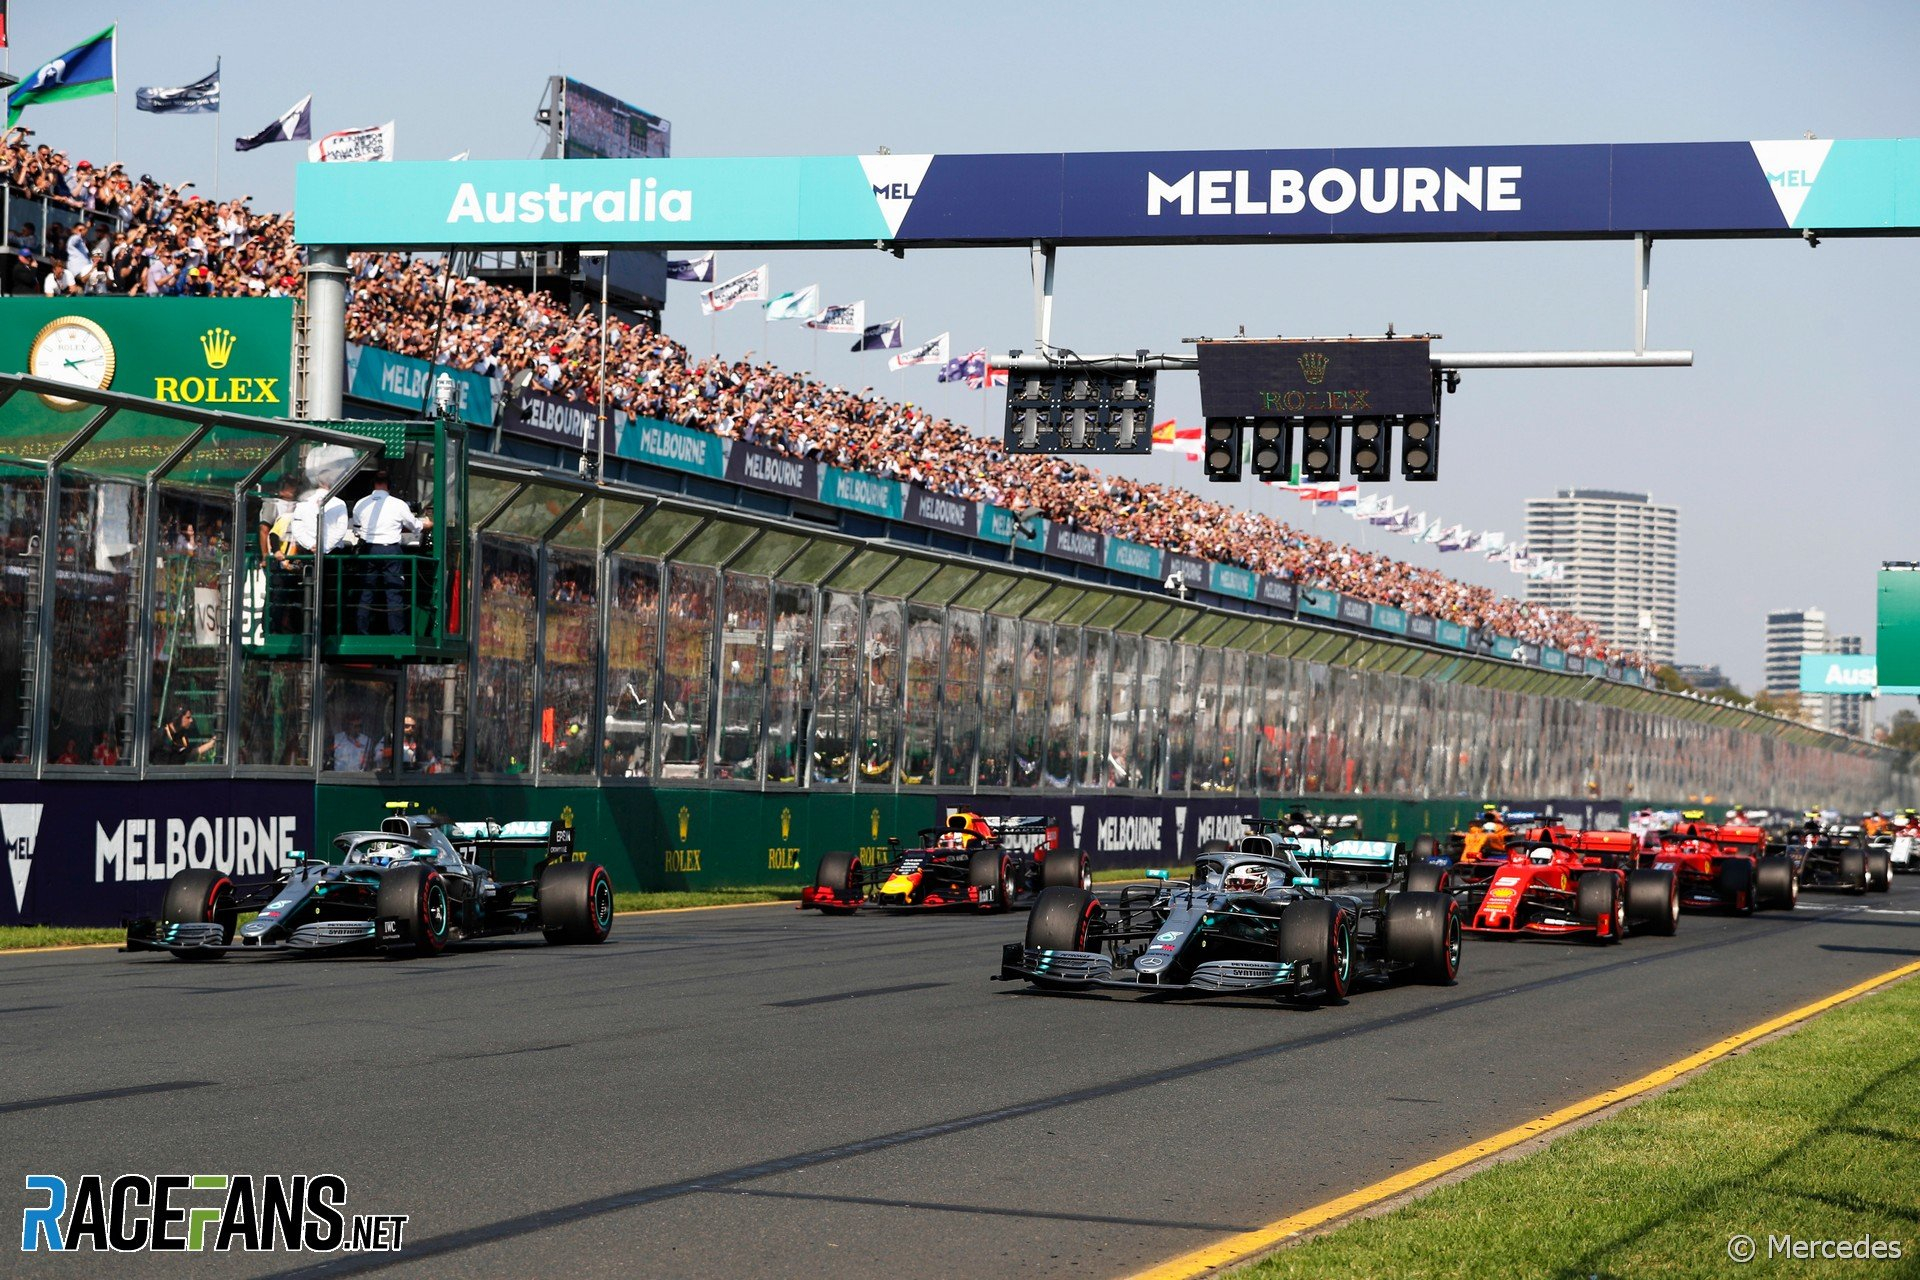 2019 F1 Calendar: Formula One Race Schedule - Racefans Formula 1 Calendar 2019 Dates